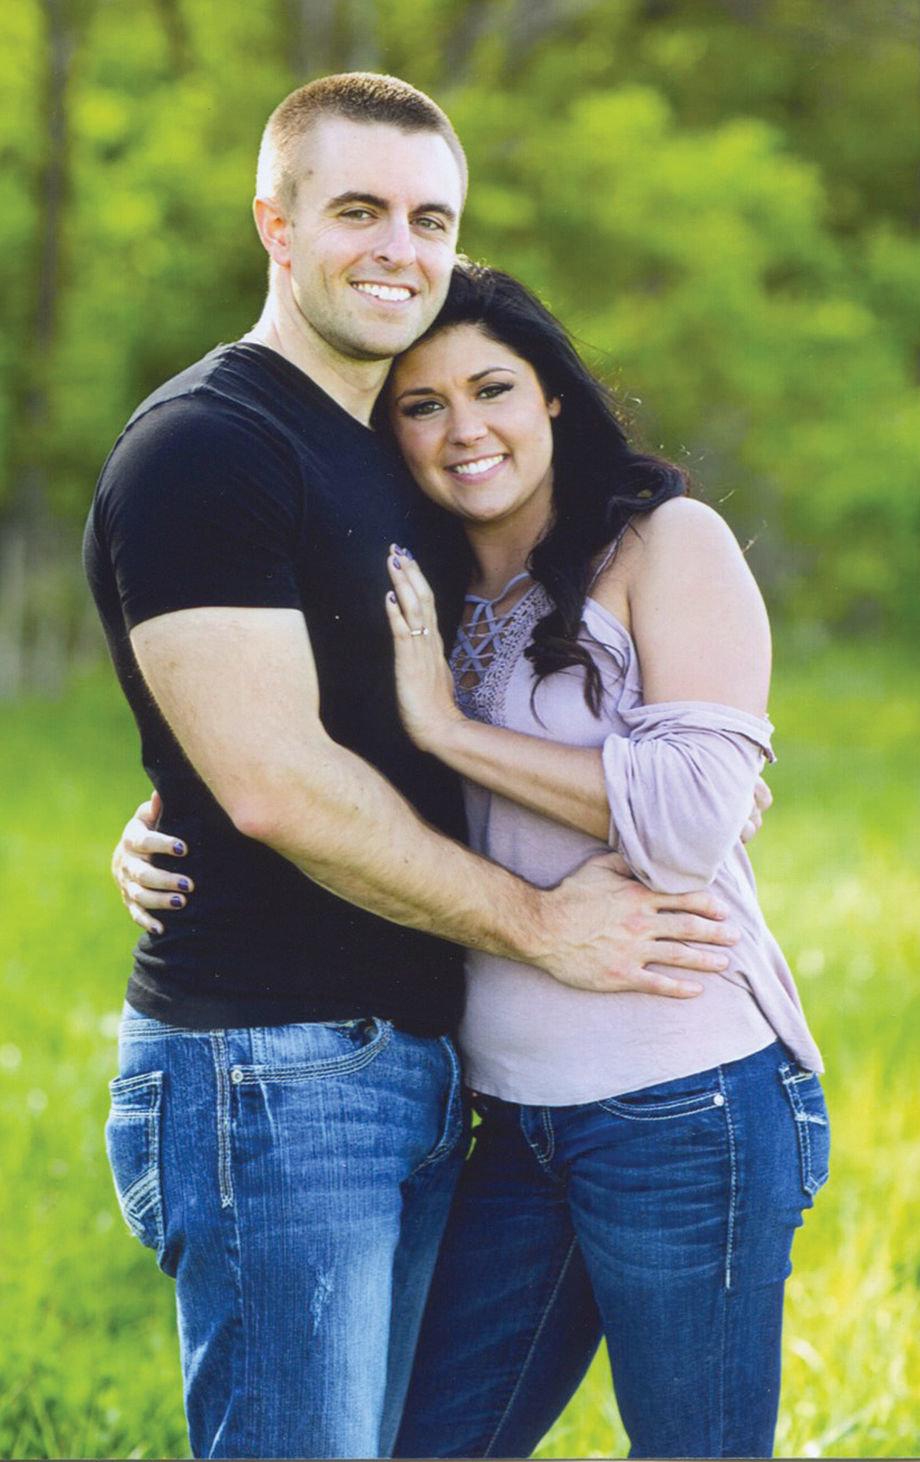 Indiana dating lover 2013 rødt flagg dating skilt